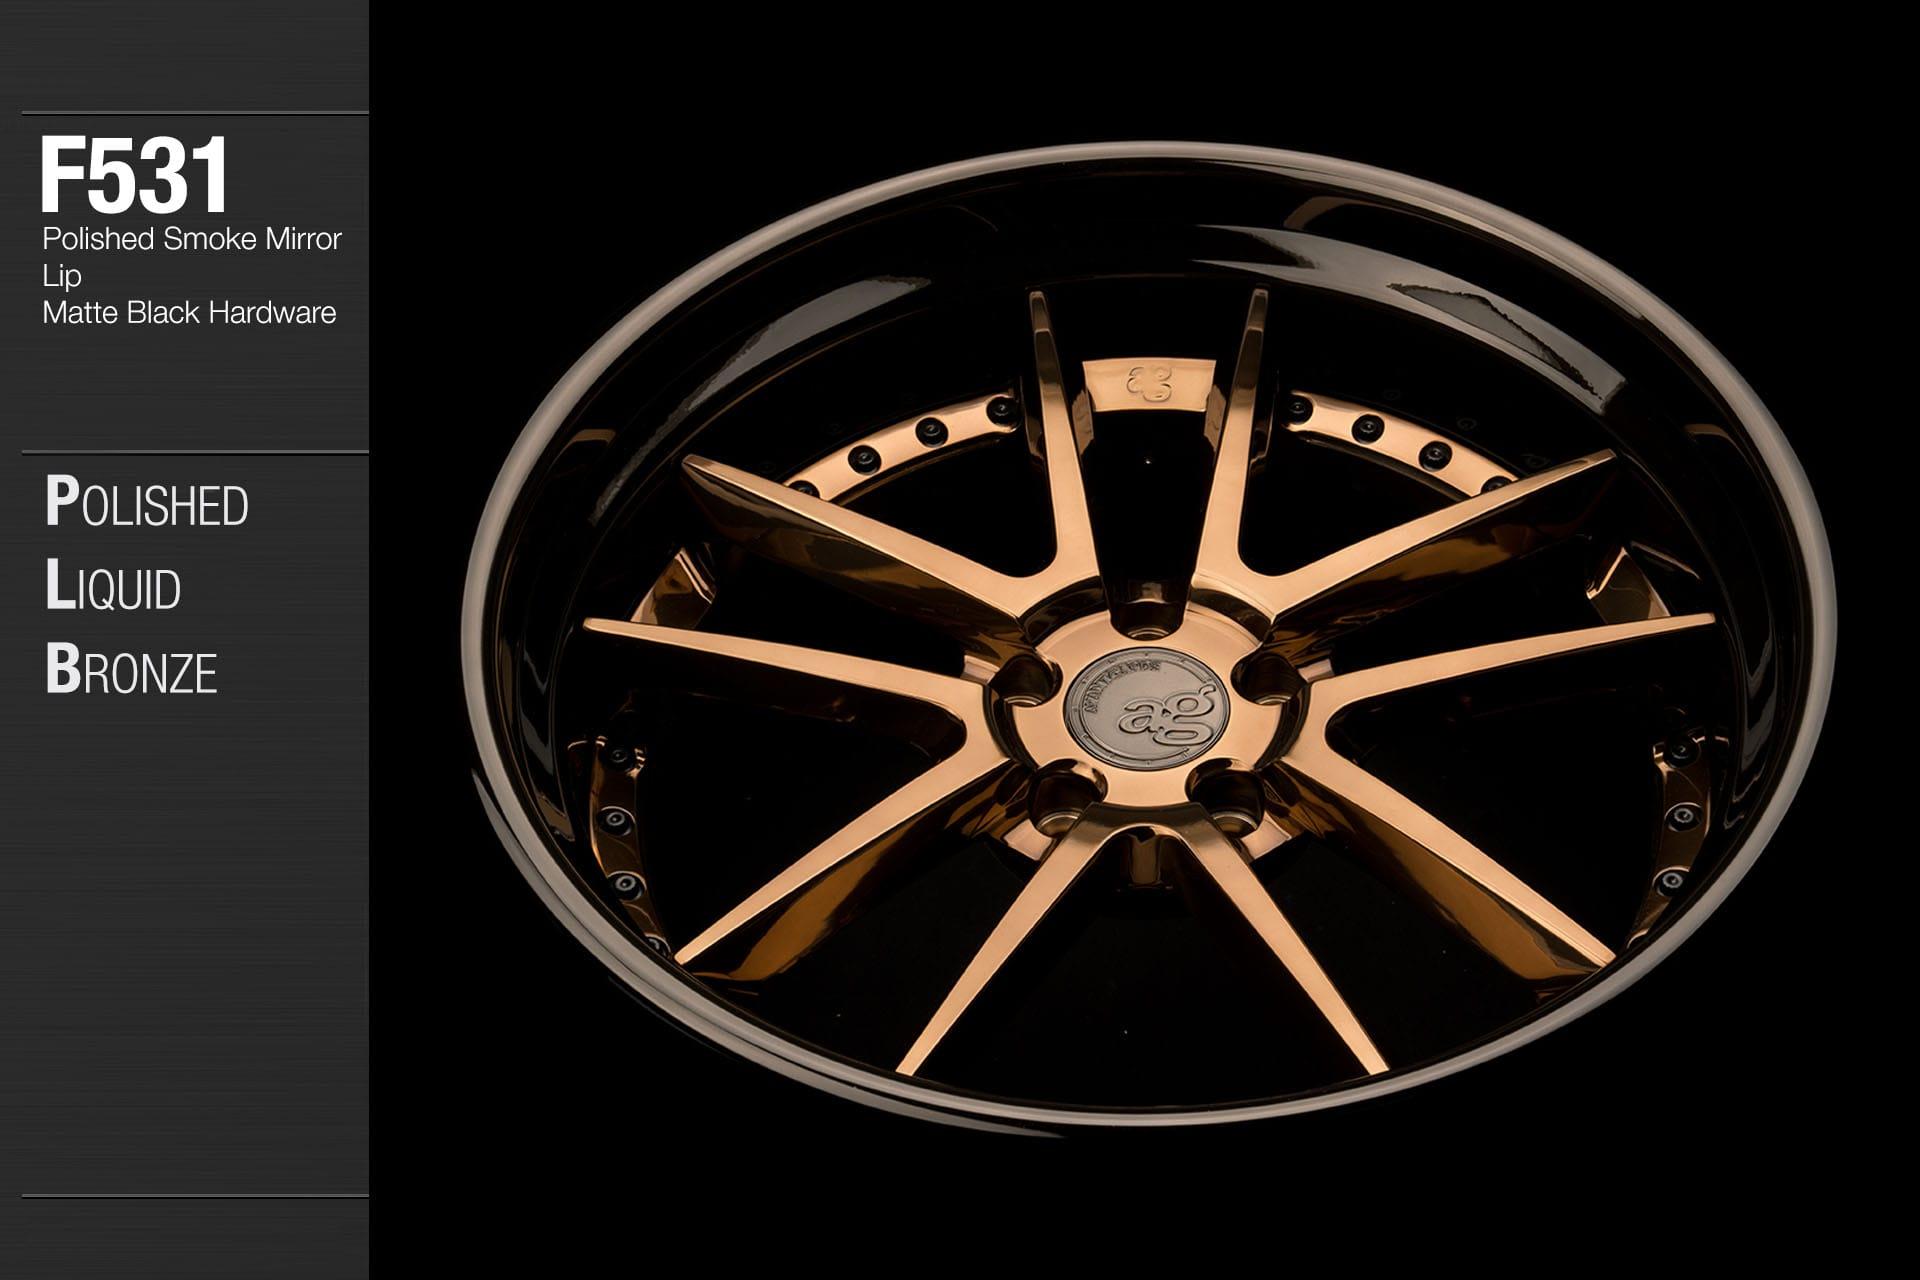 avant-garde-ag-wheels-f531-polished-liquid-bronze-face-smoke-mirror-lip-matte-black-hardware-3-min